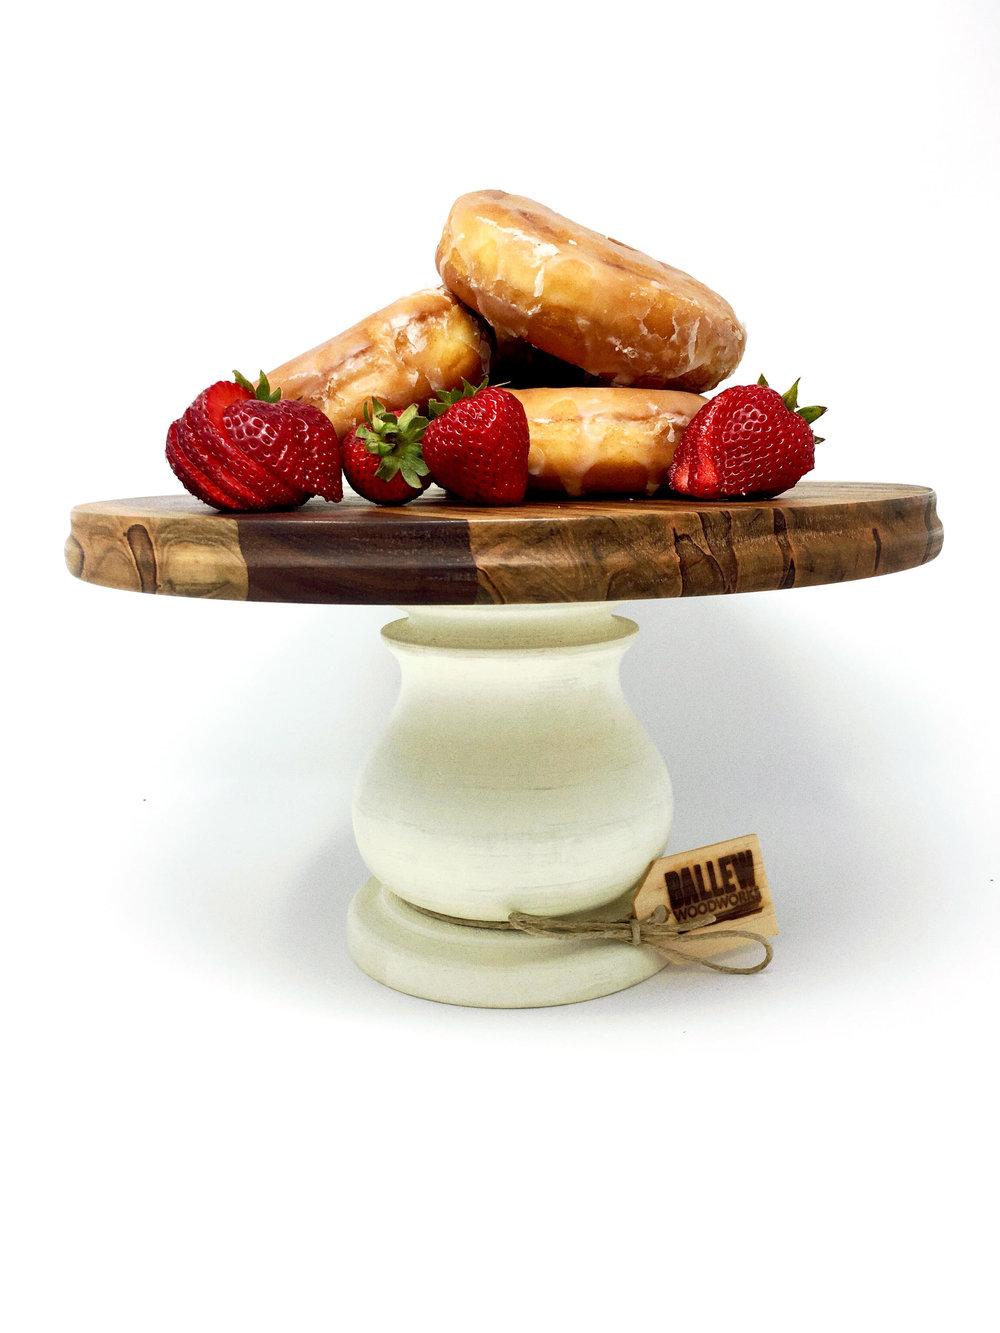 Dessert Stands - Dessert and Cake Stands